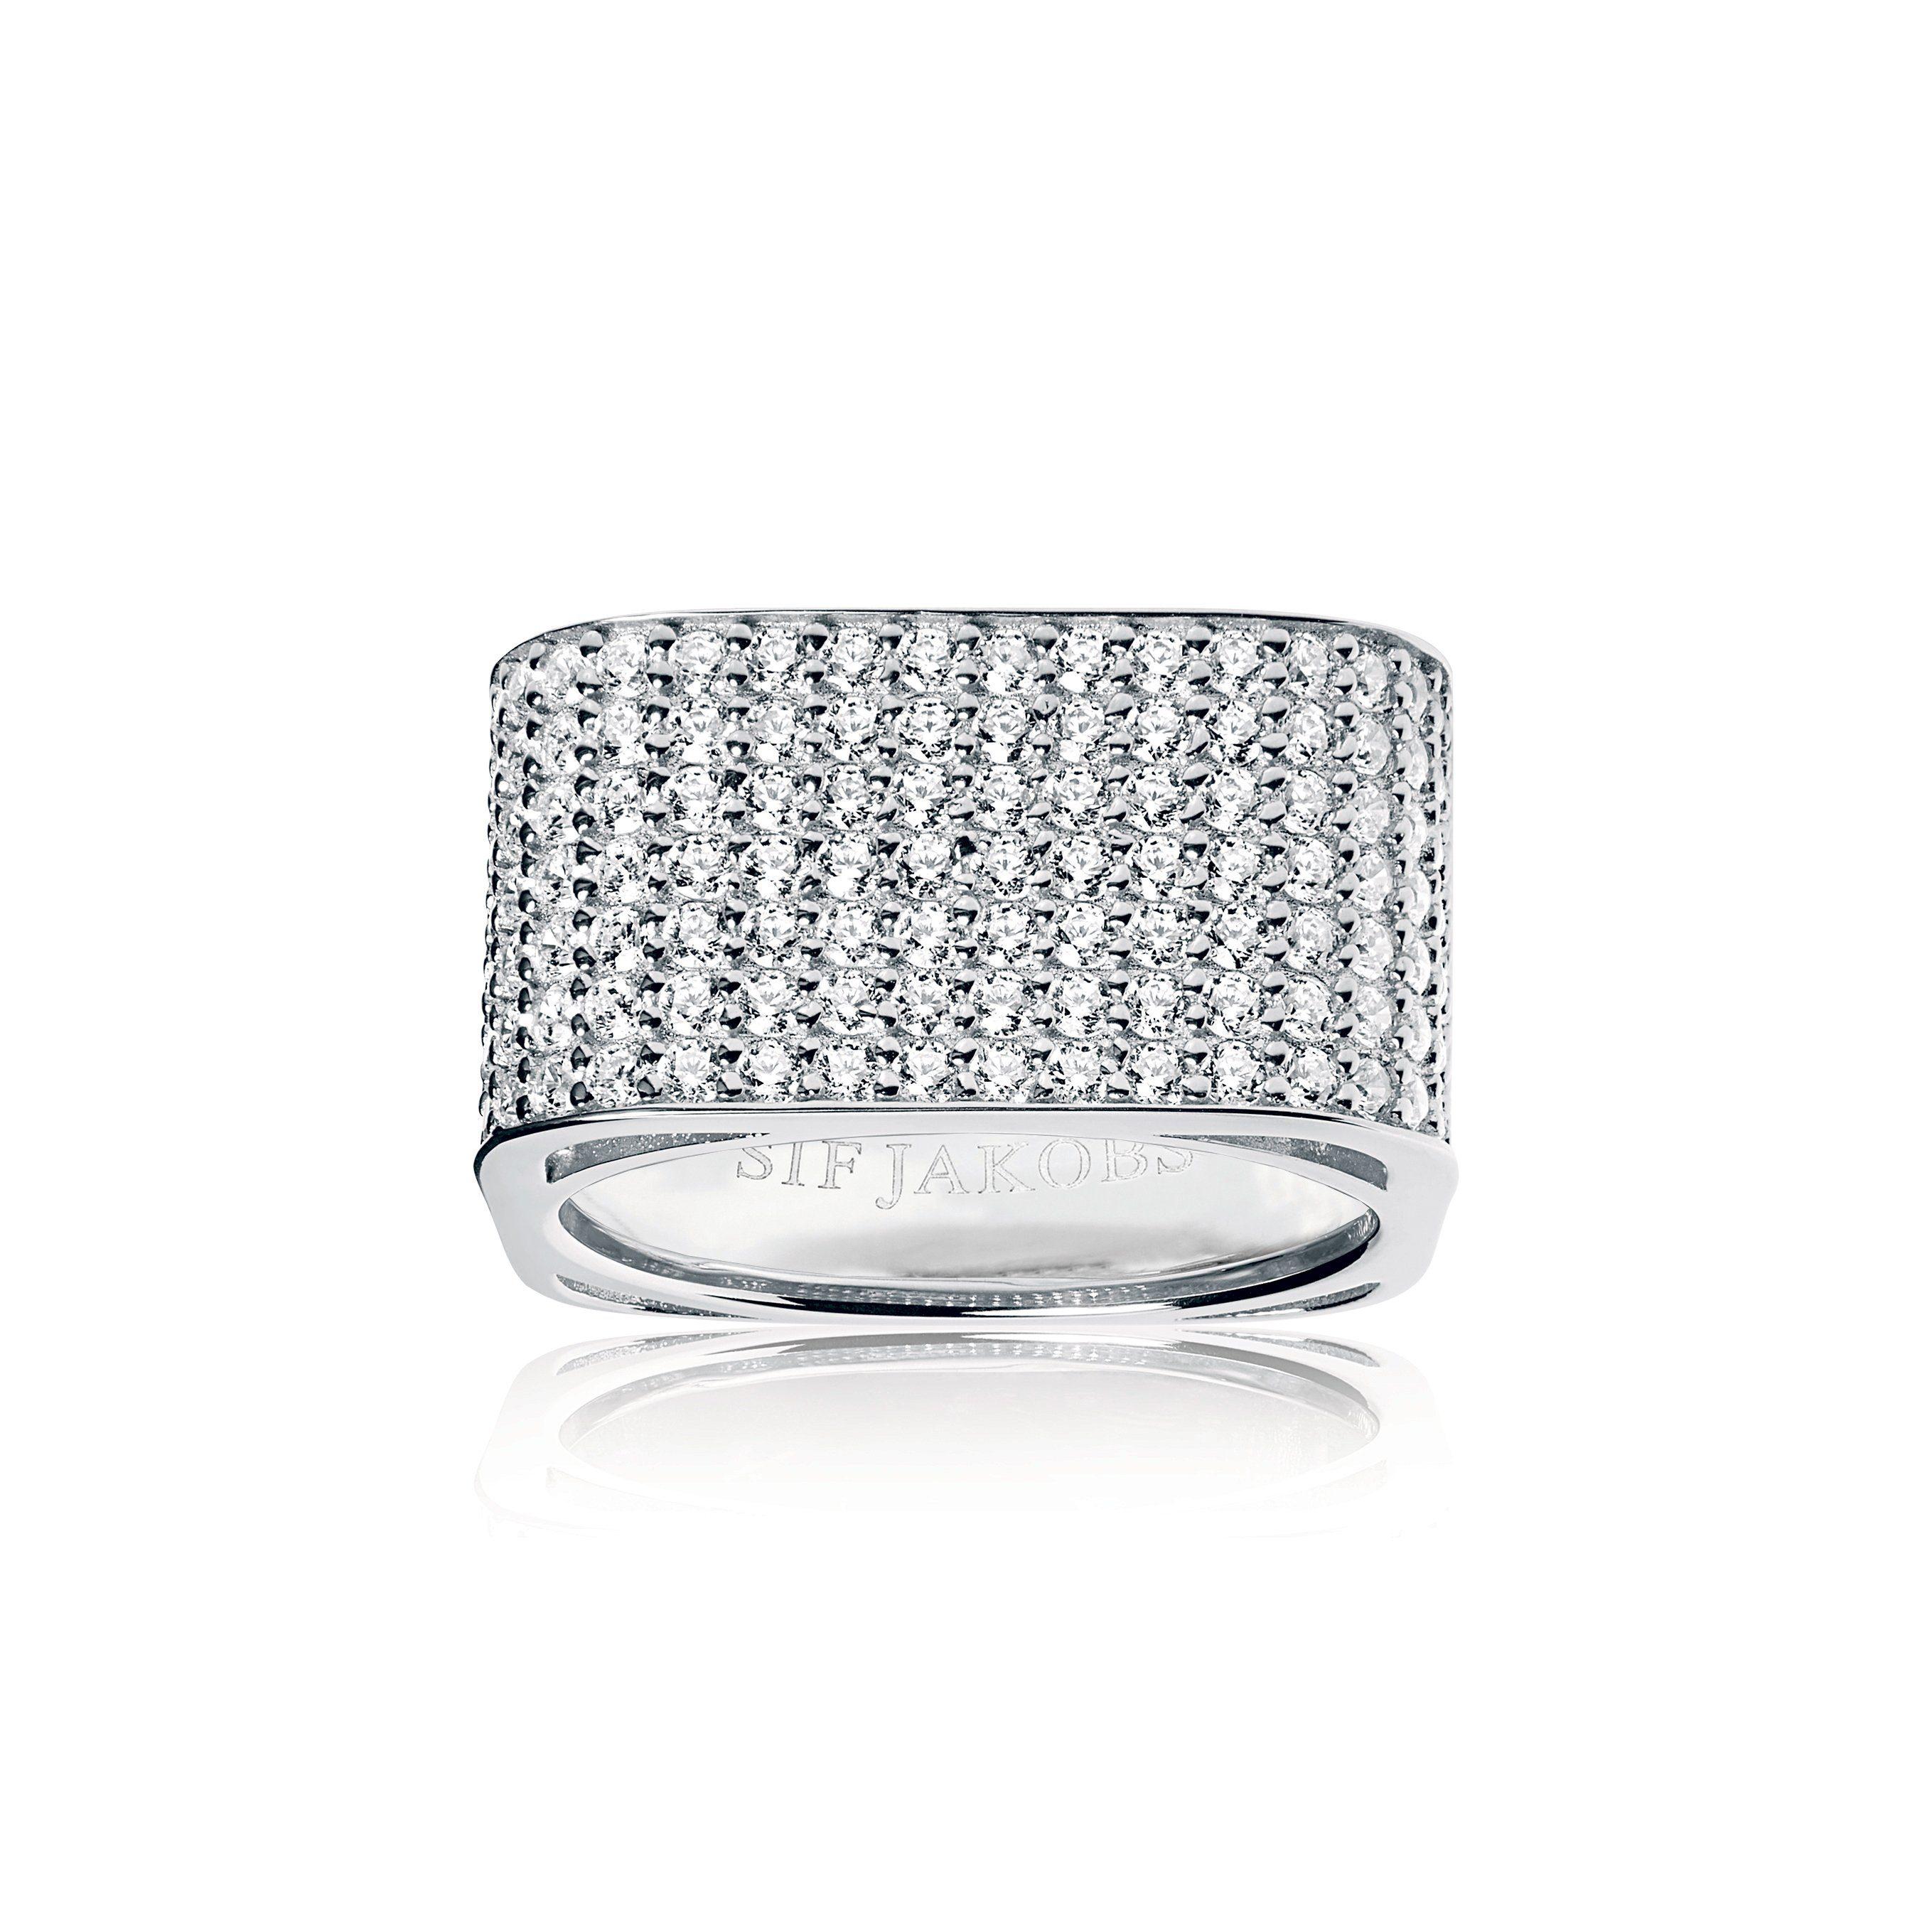 Sif Jakobs Jewellery Ring in besonders breiter Form online kaufen   OTTO